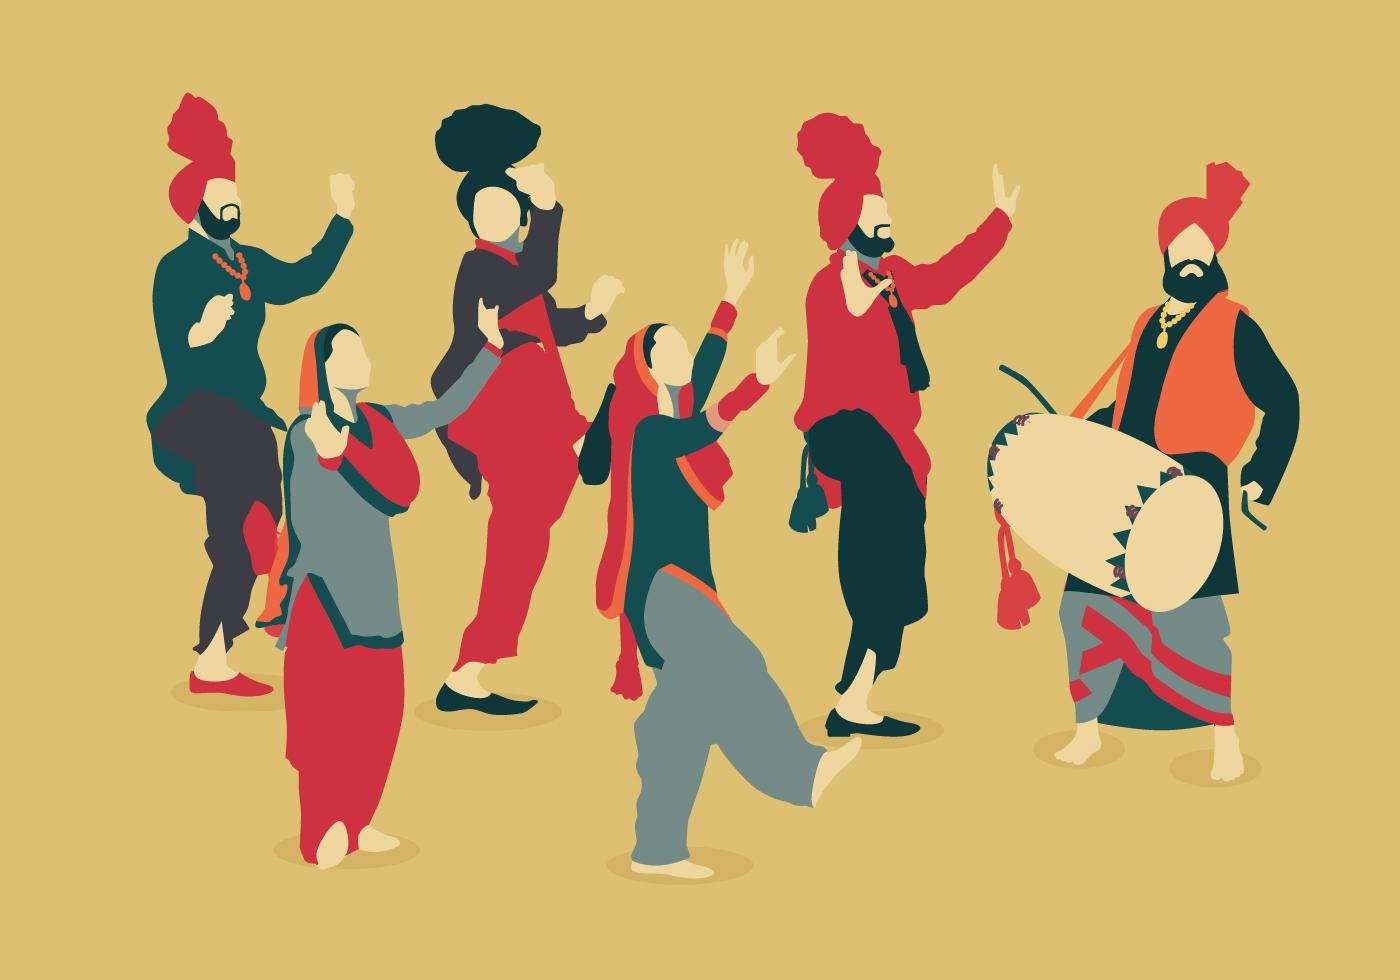 Bhangra Vintage Color Dancer Vectors - Download Free ...